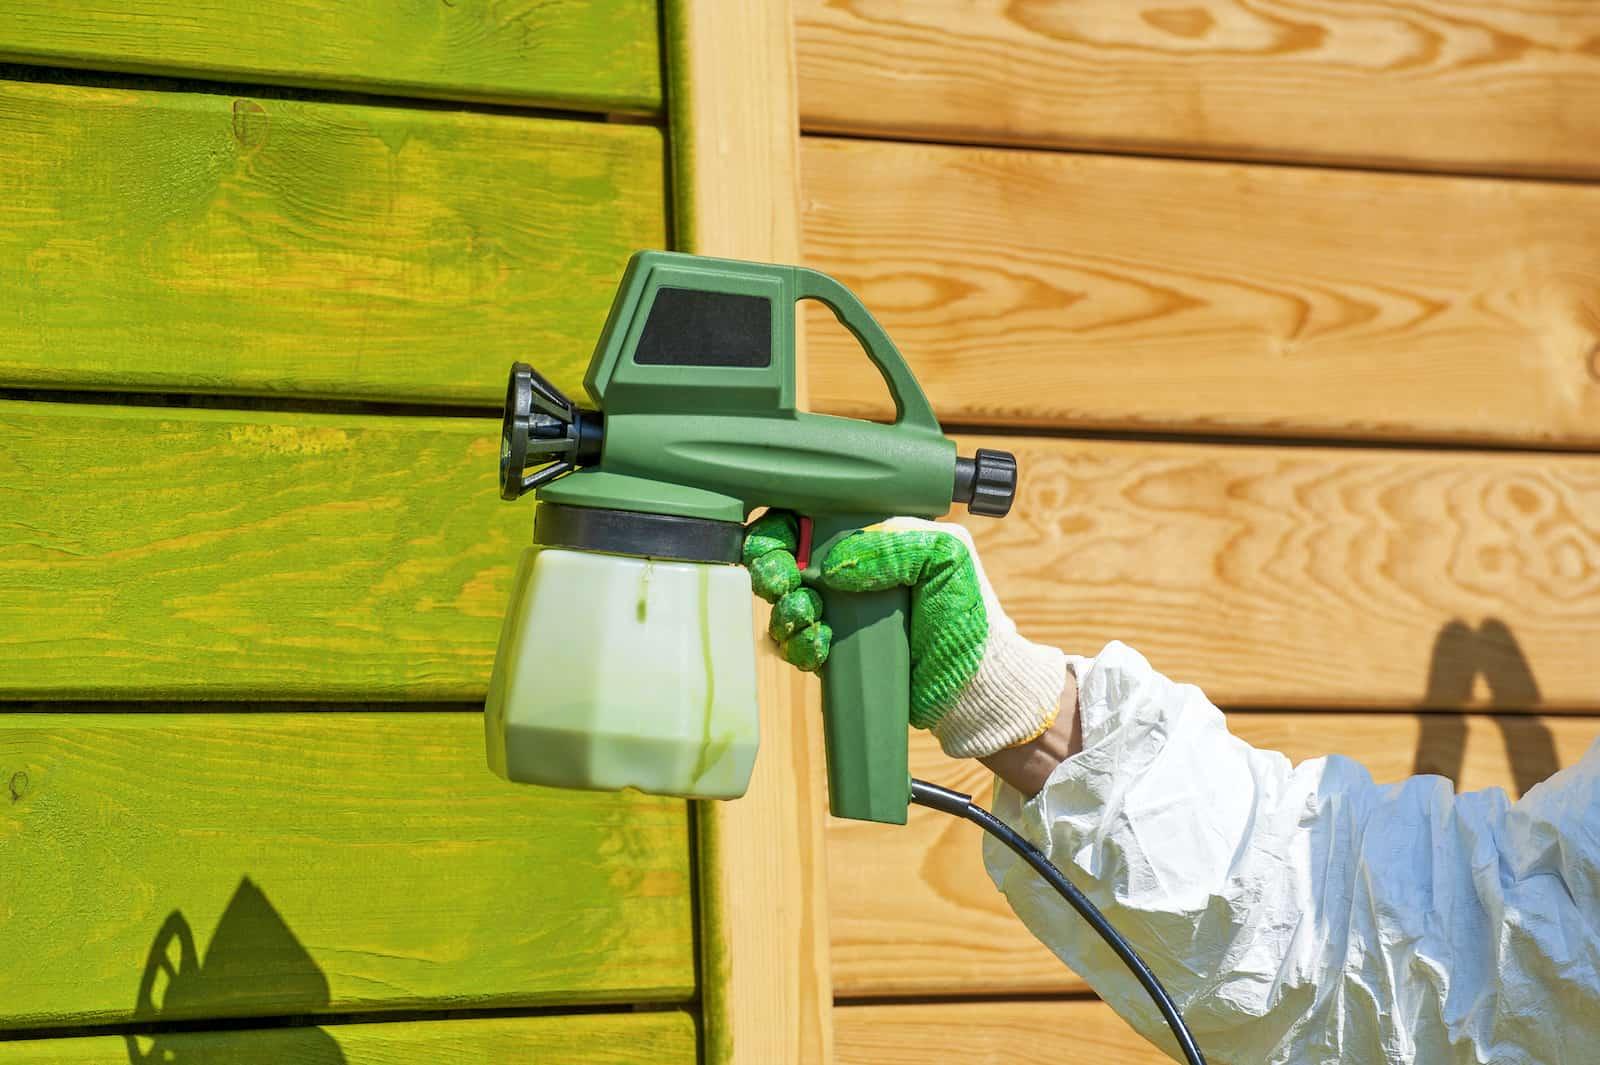 7 Best Paint Sprayers of 2021